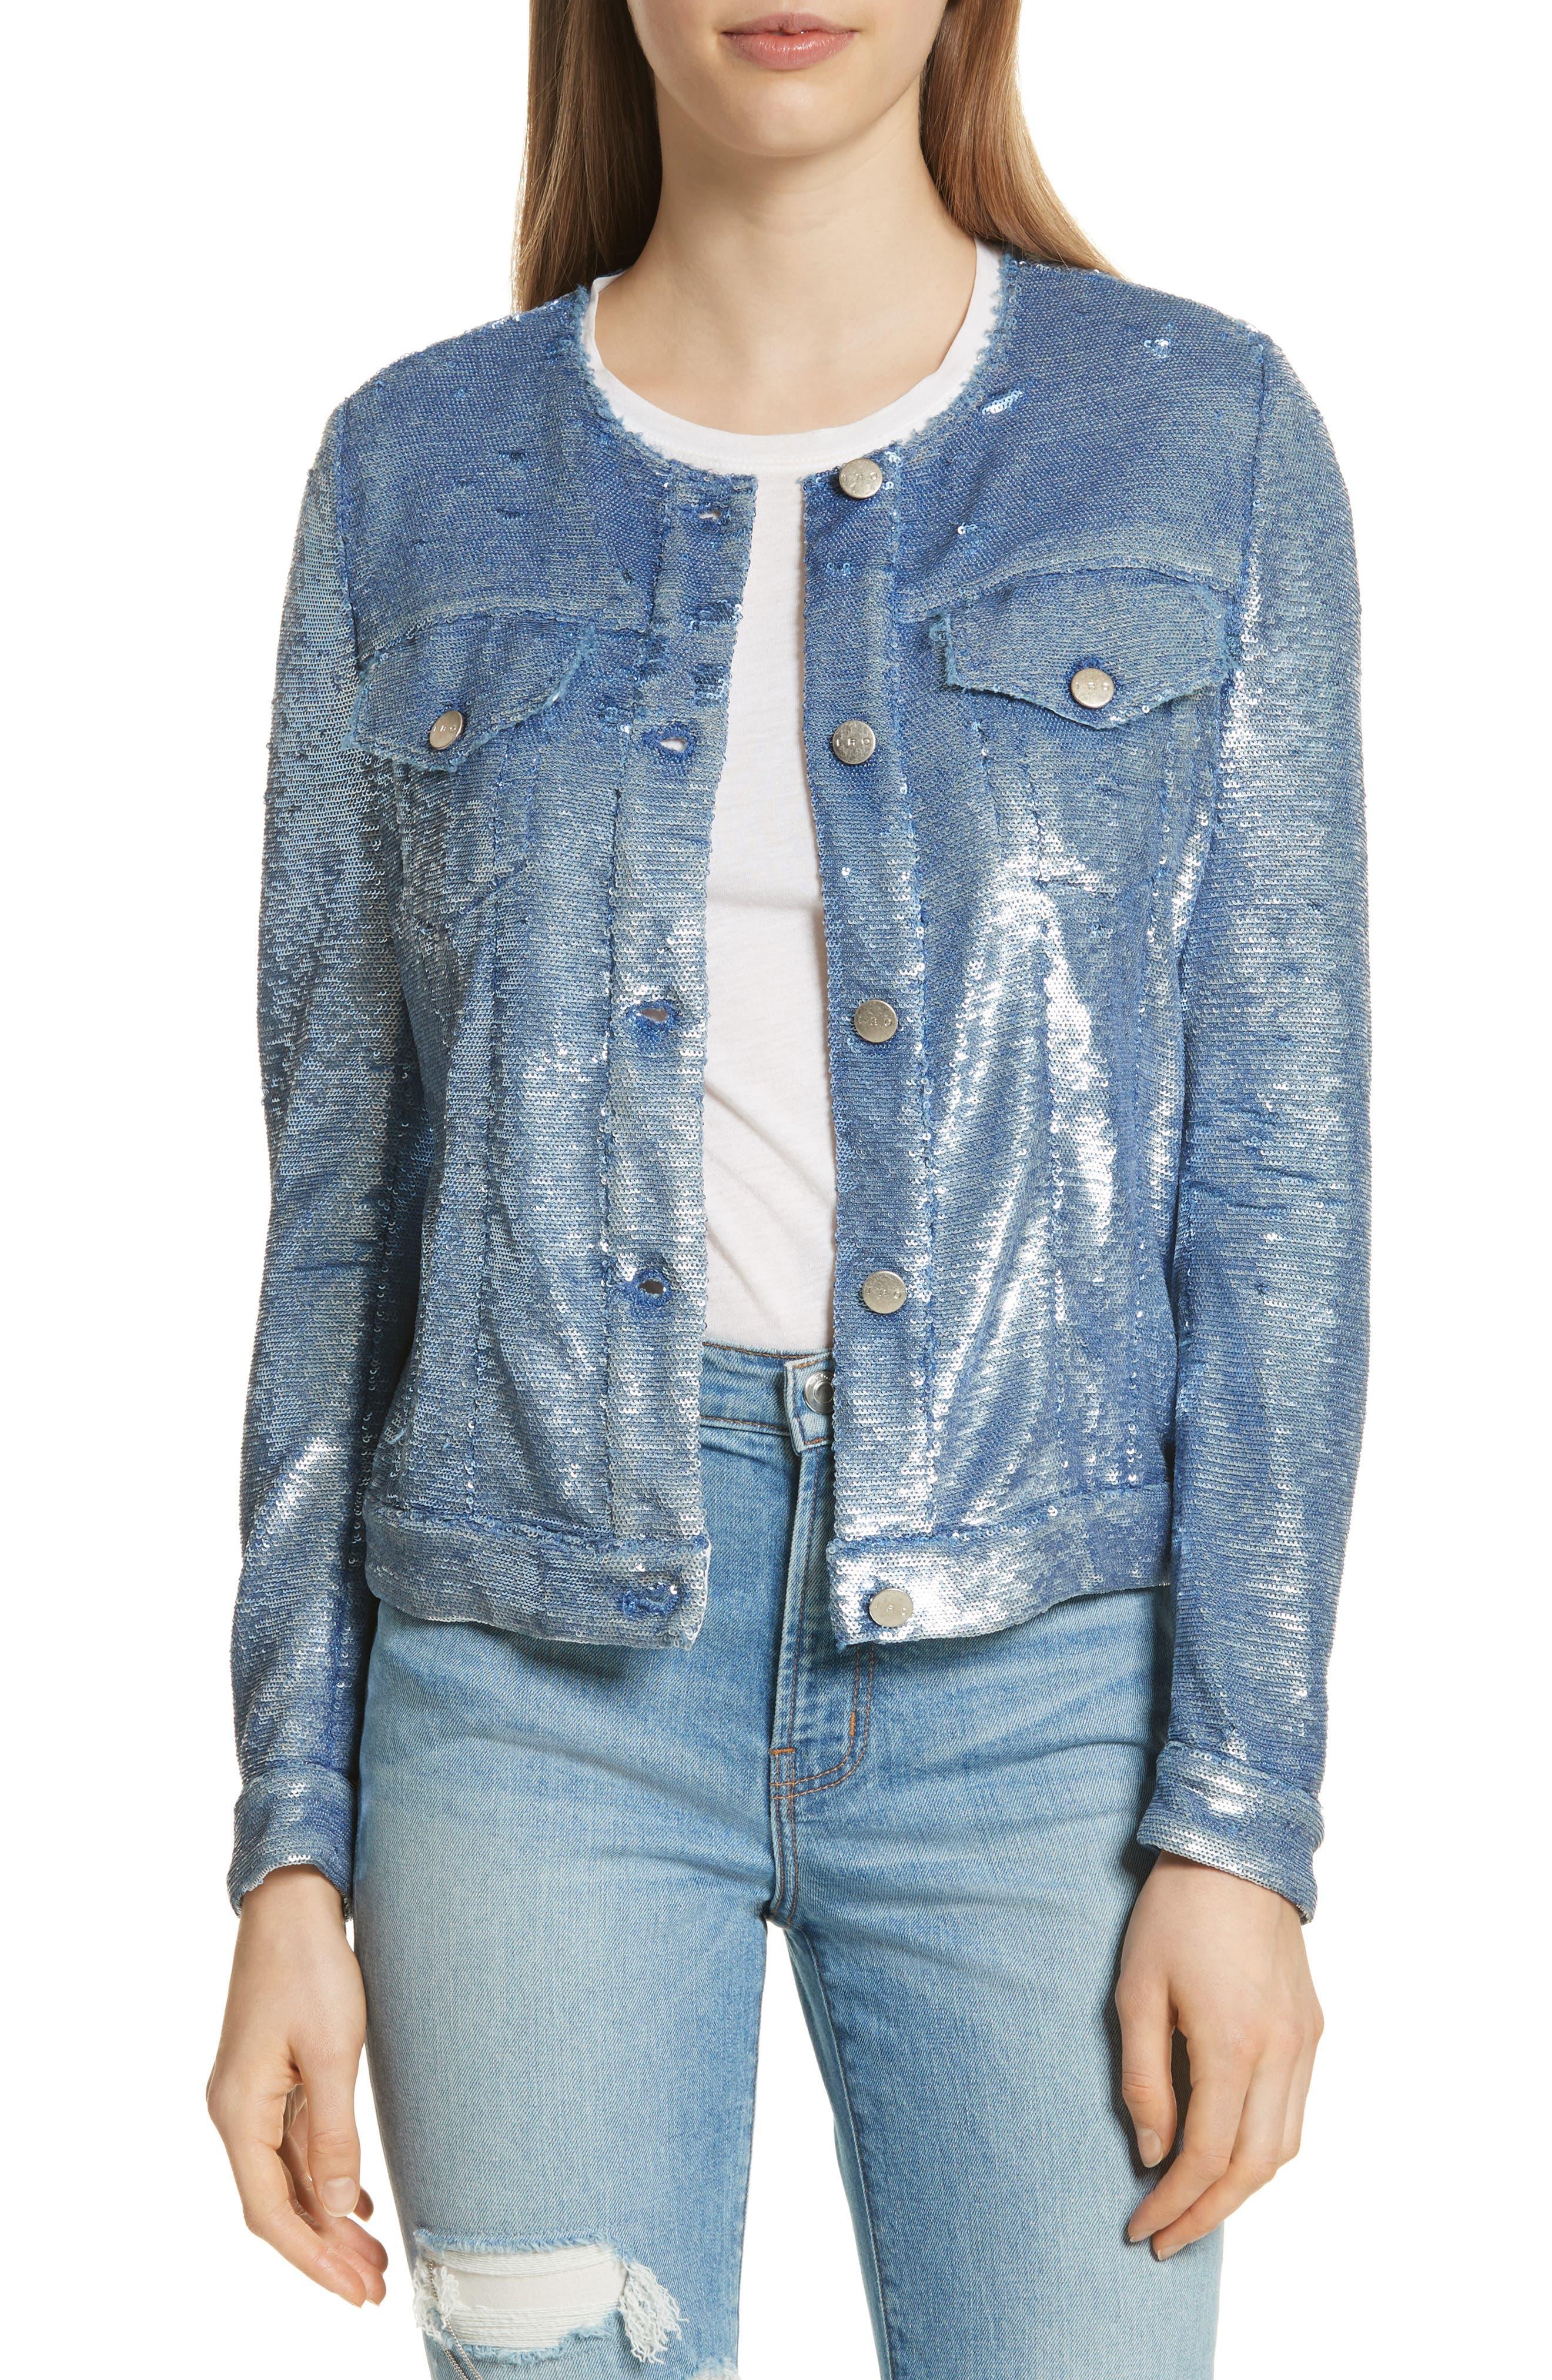 Dalome Sequin Jacket,                         Main,                         color, Blushed Blue